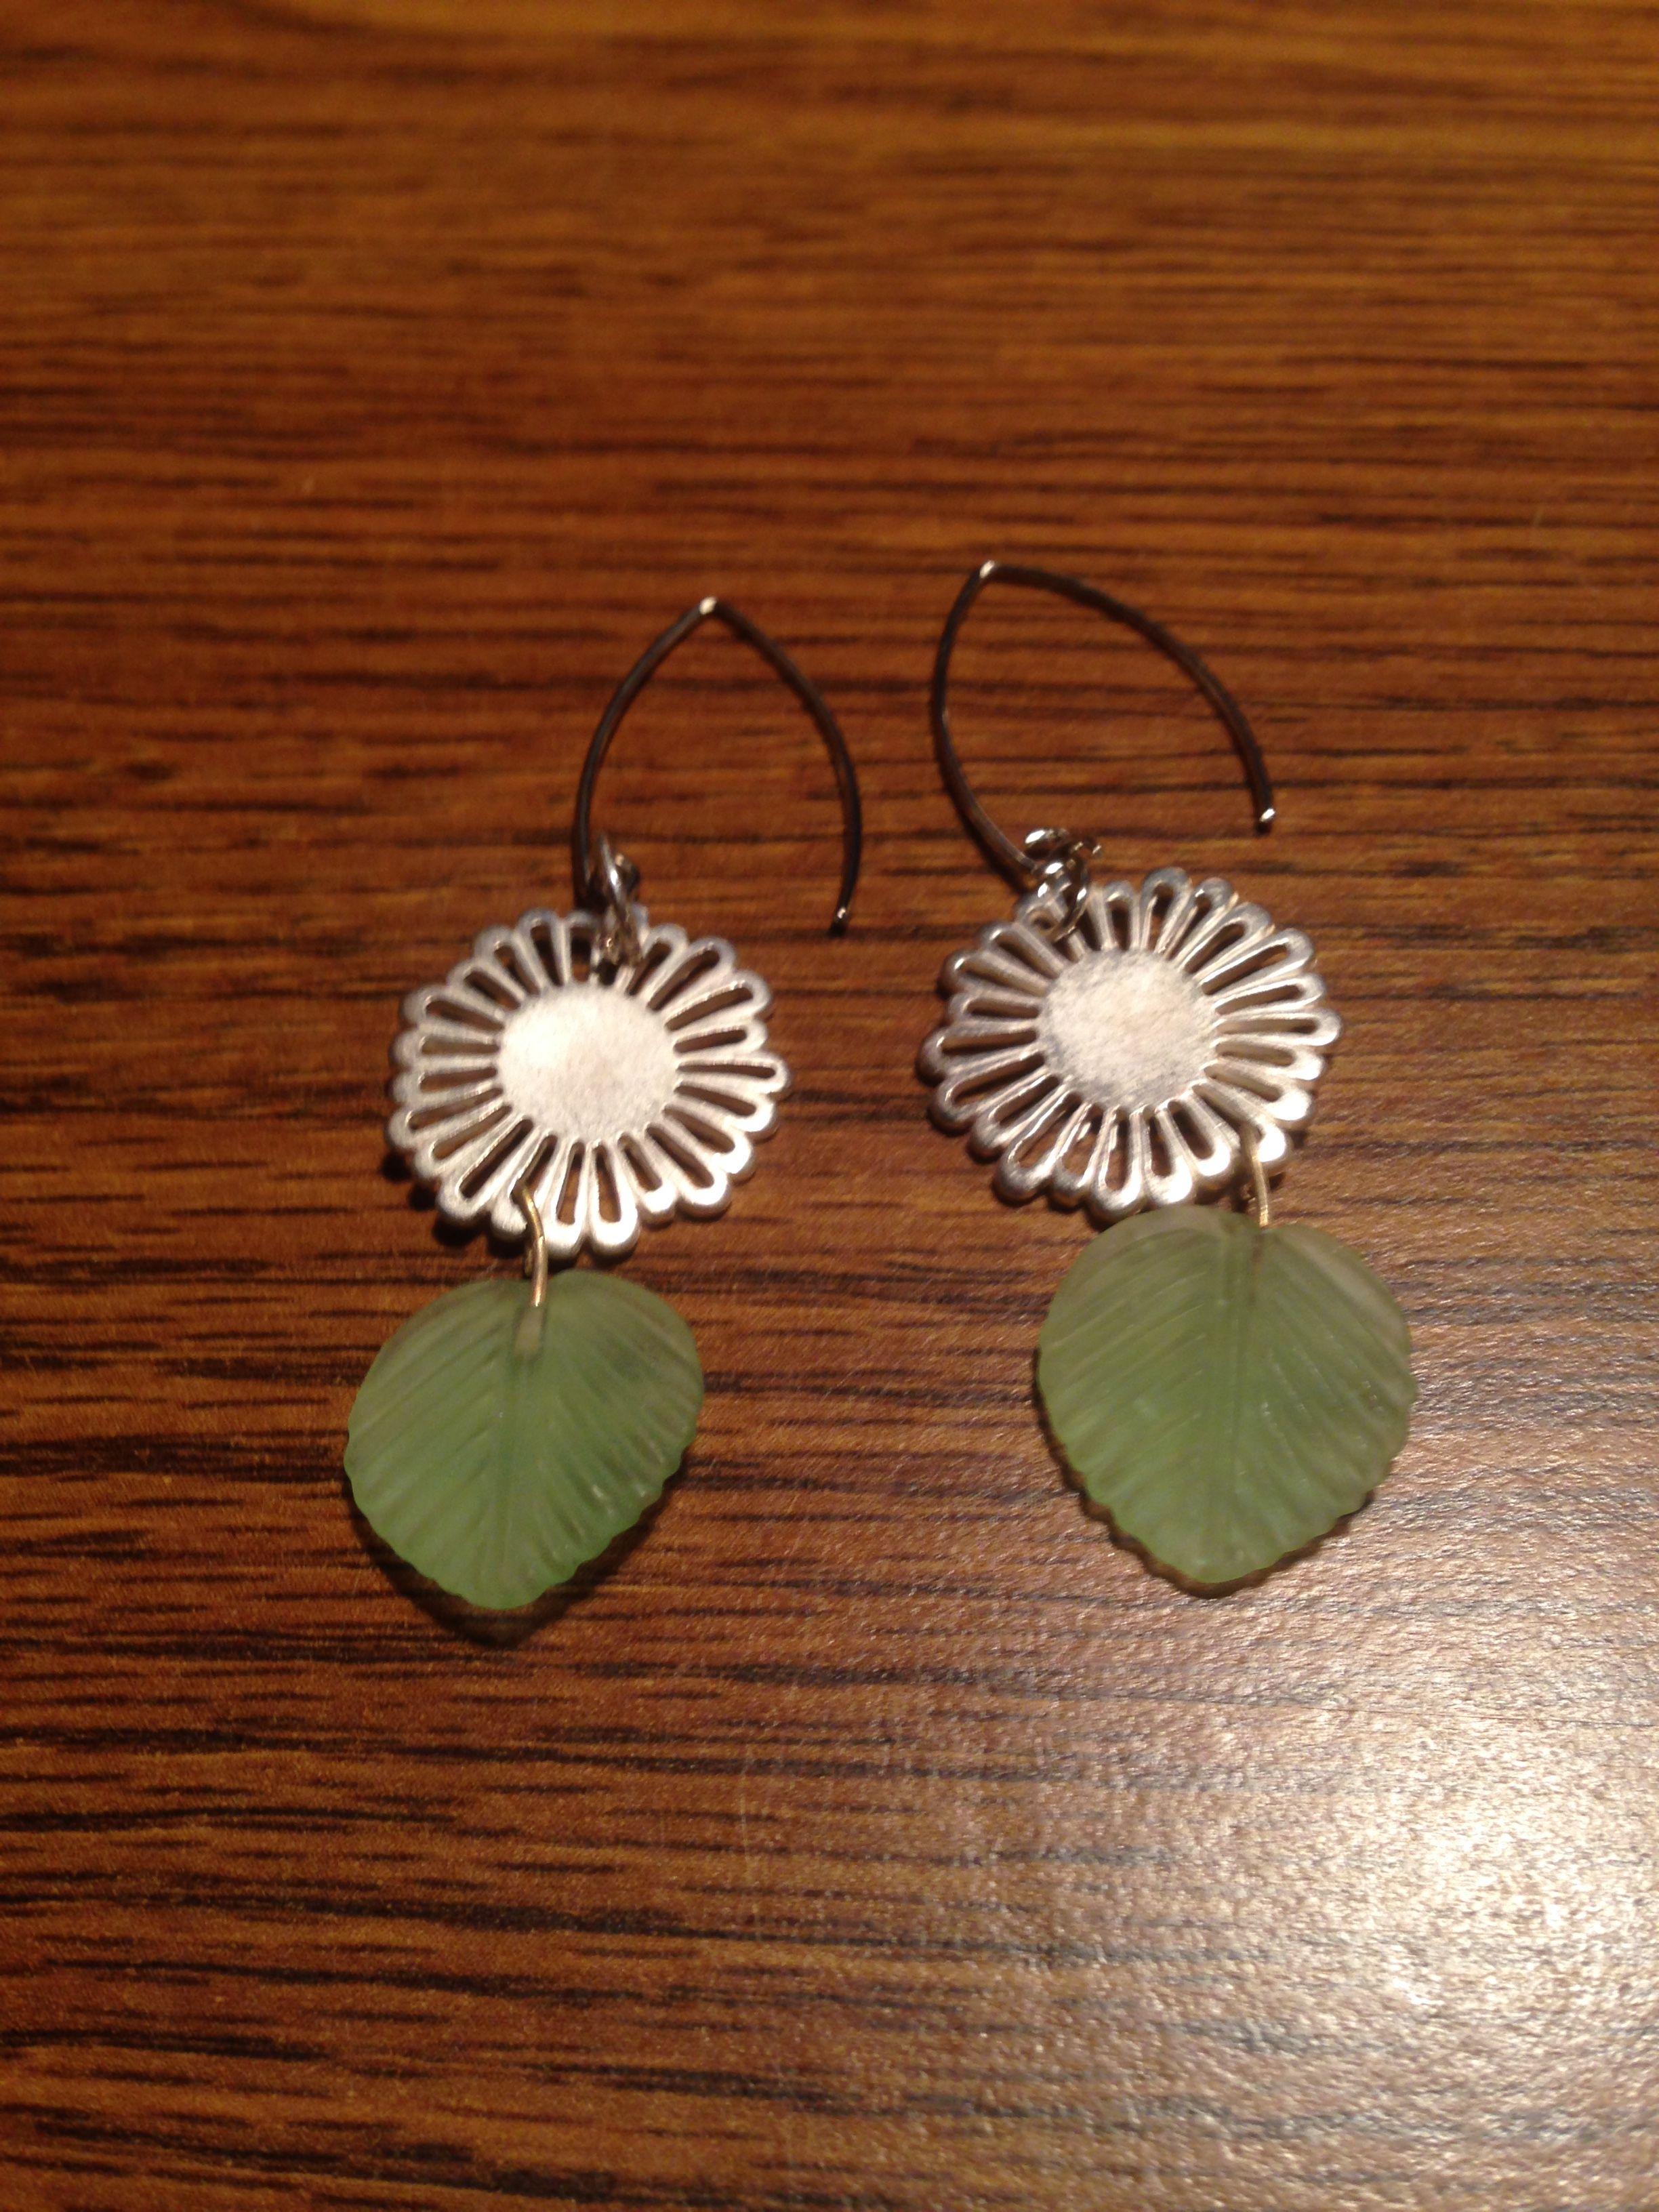 handcrafted Earrings $ 5